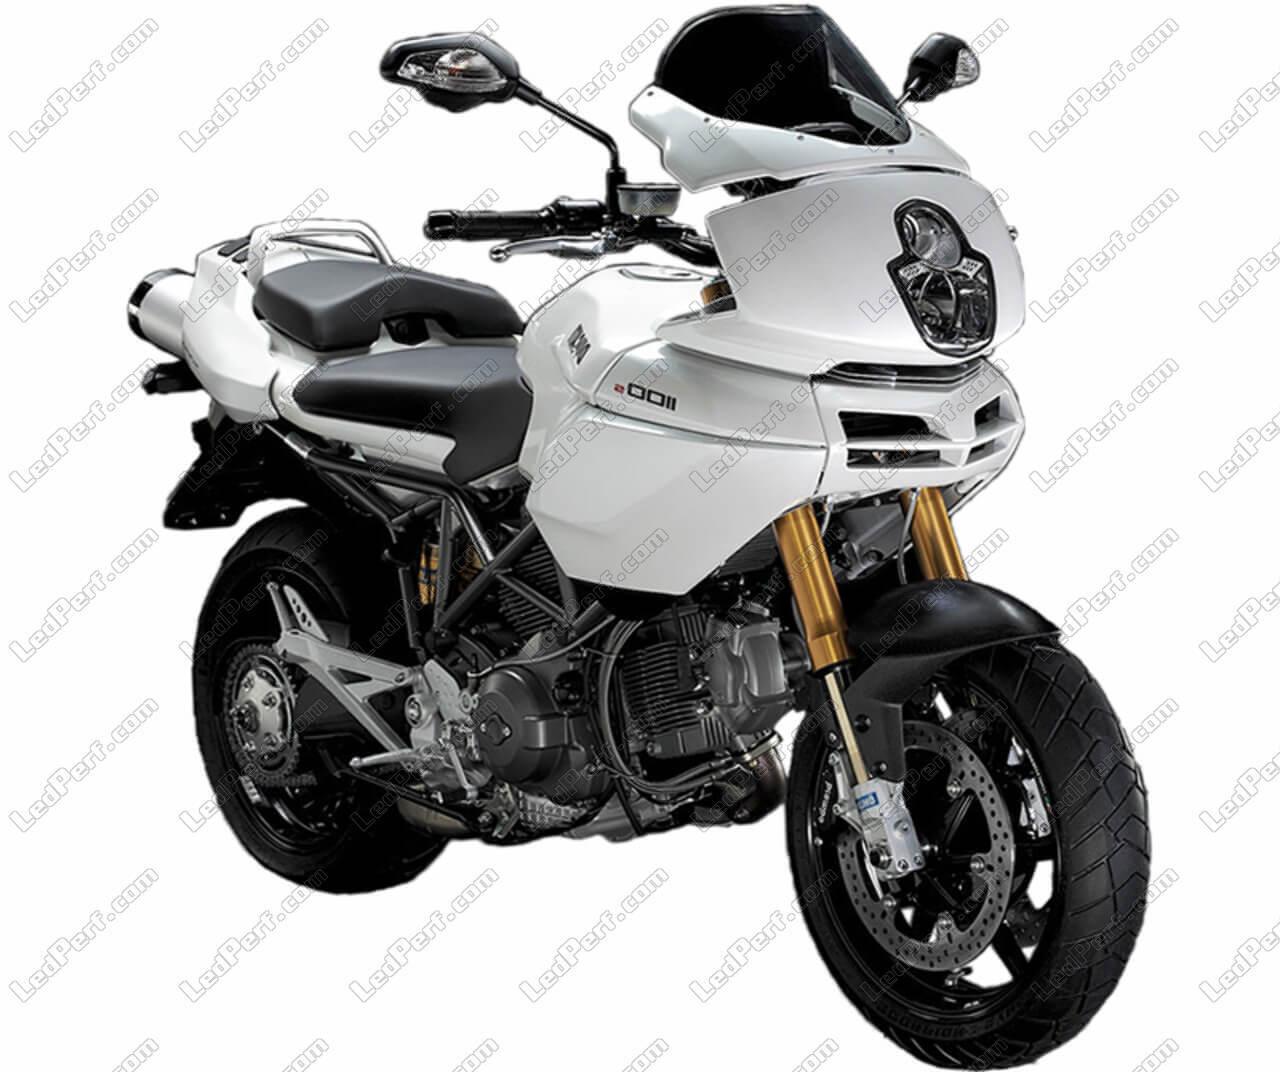 Packs Par Marque Moto Scooter Quad Ssv Spyder Ducati Multistrada 1100